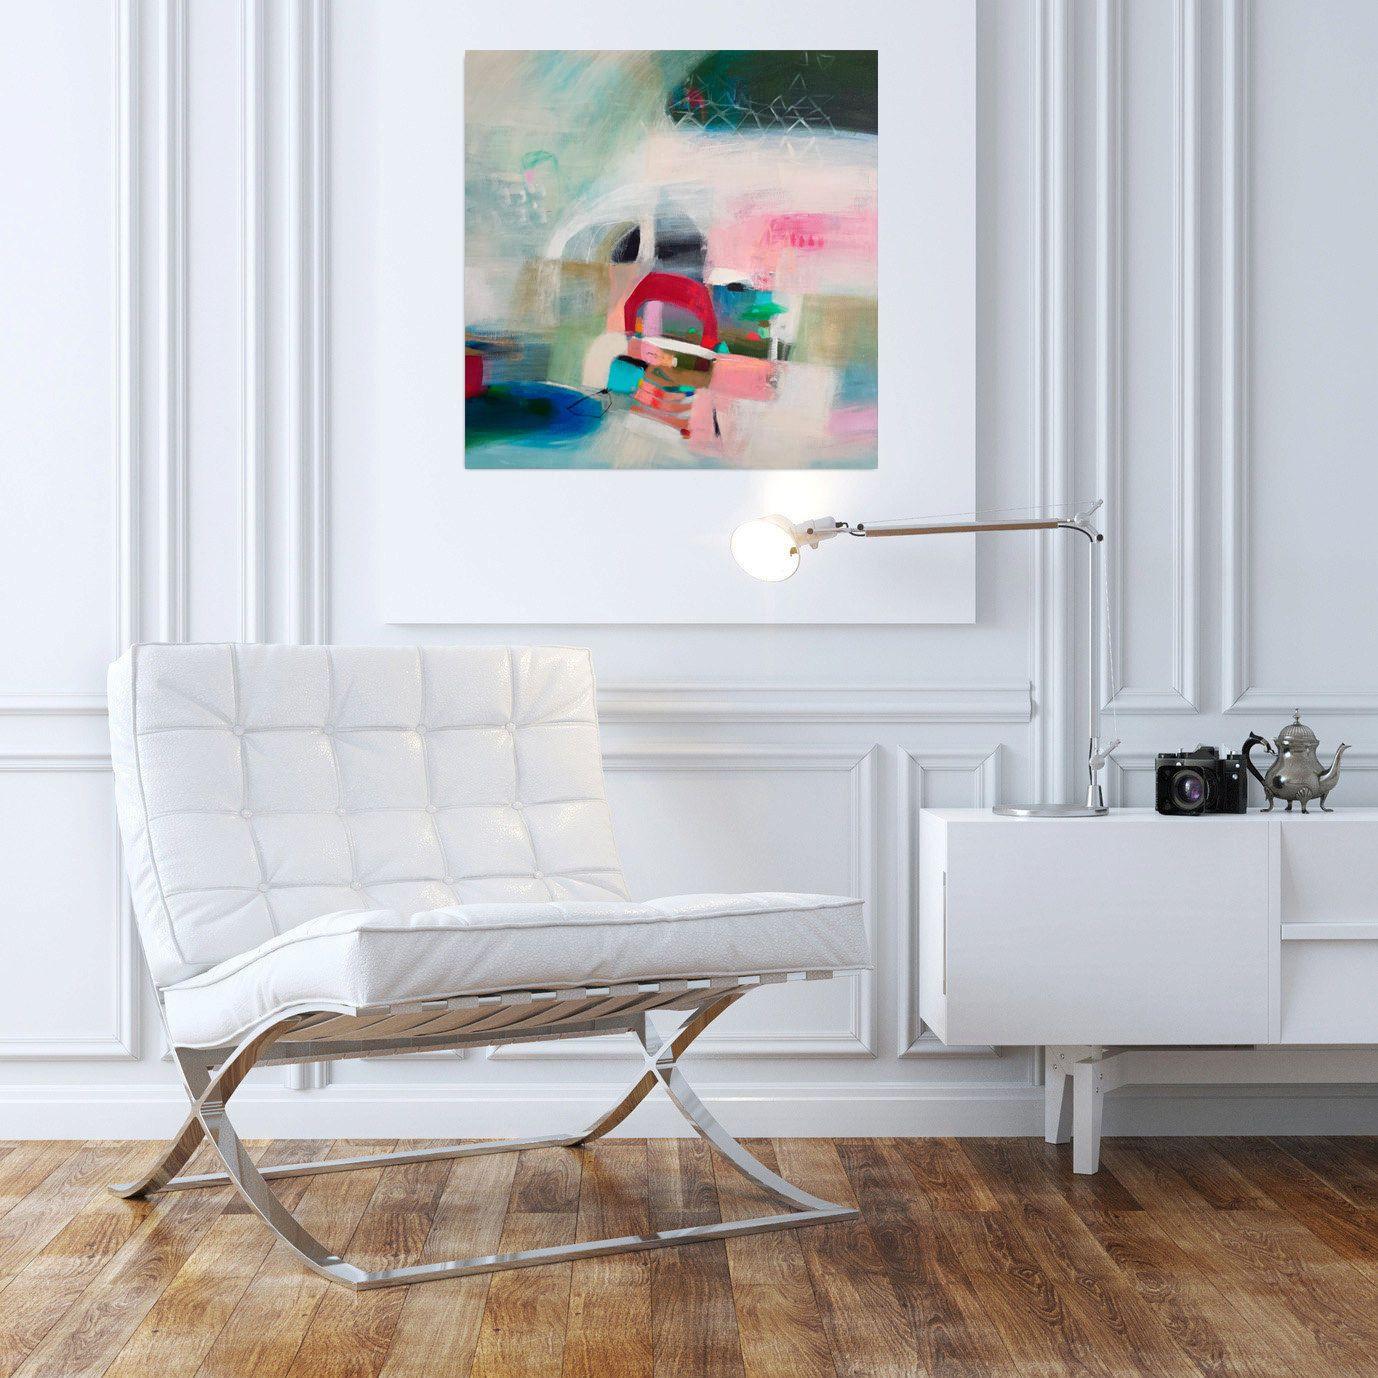 Abstract painting wall decor home decor wall art original